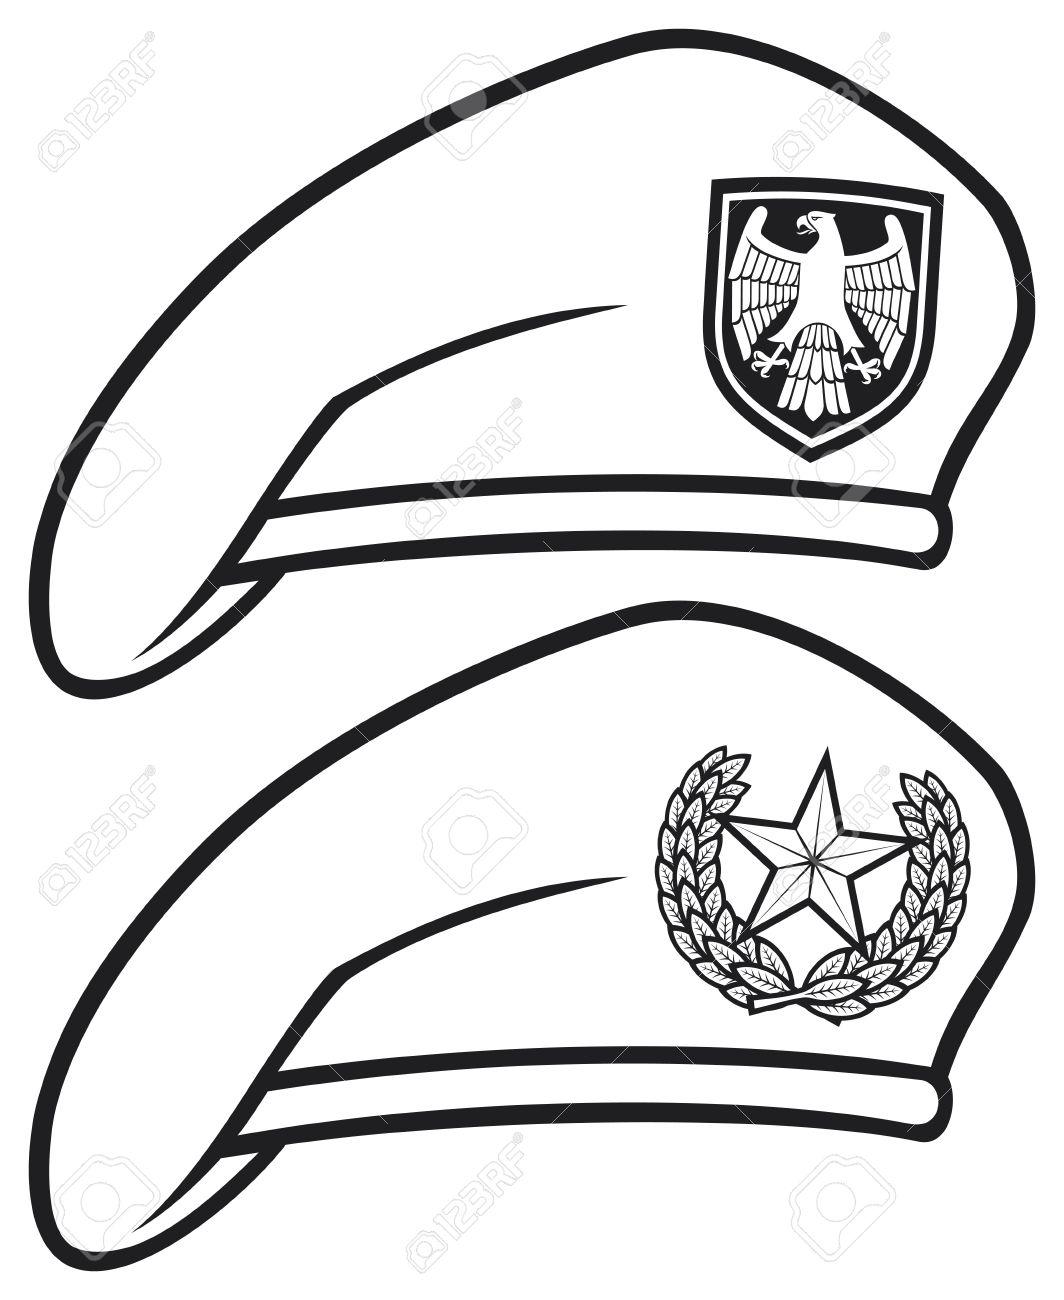 e8655e83bdd Military beret collection royalty free cliparts vectors jpg 1064x1300  Barrett hat drawing